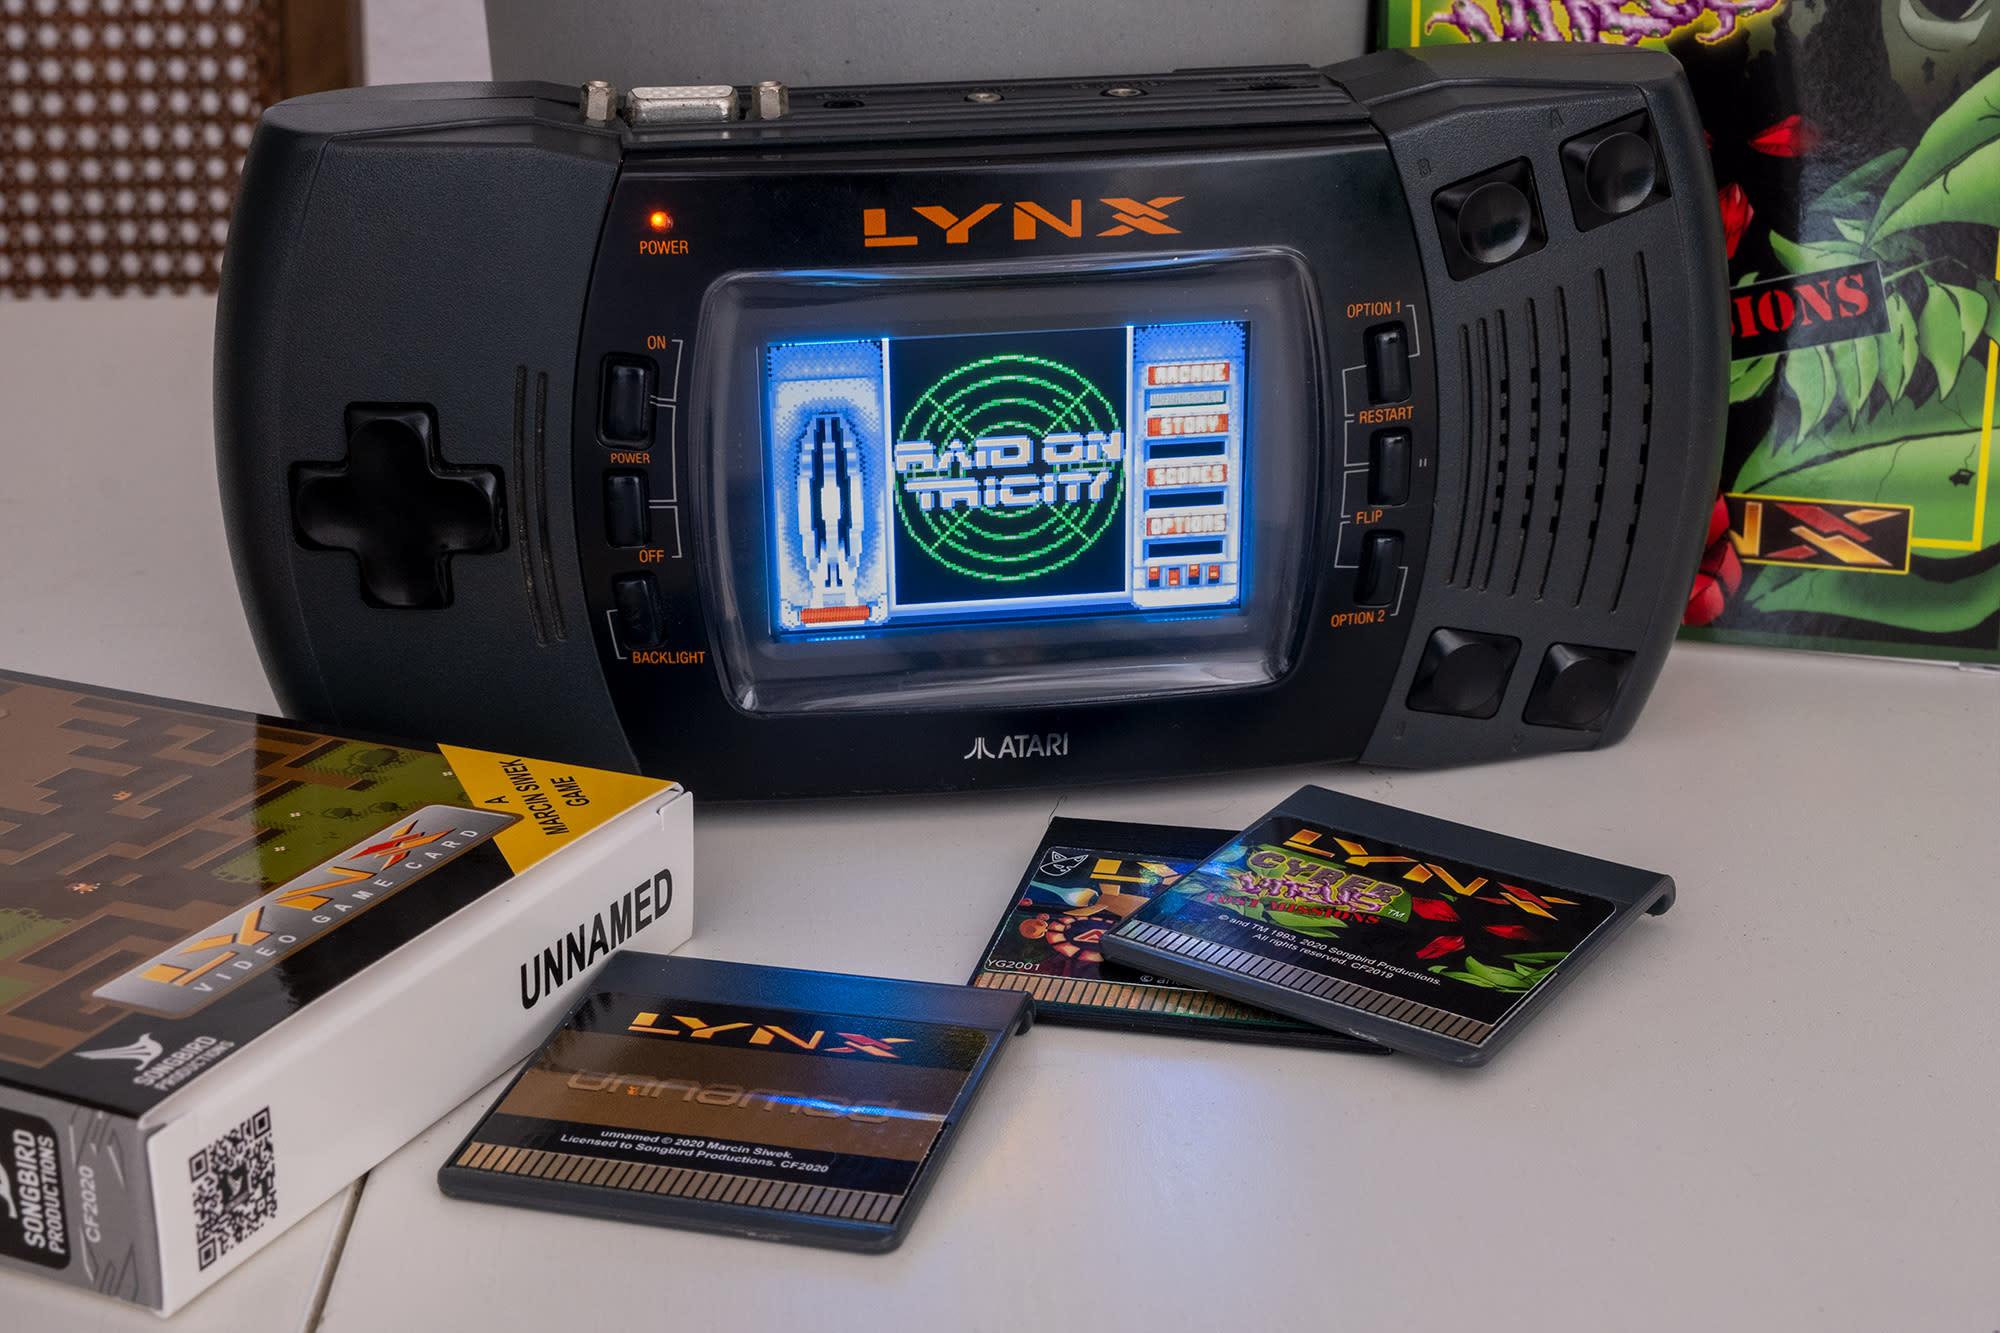 New Atari Lynx games